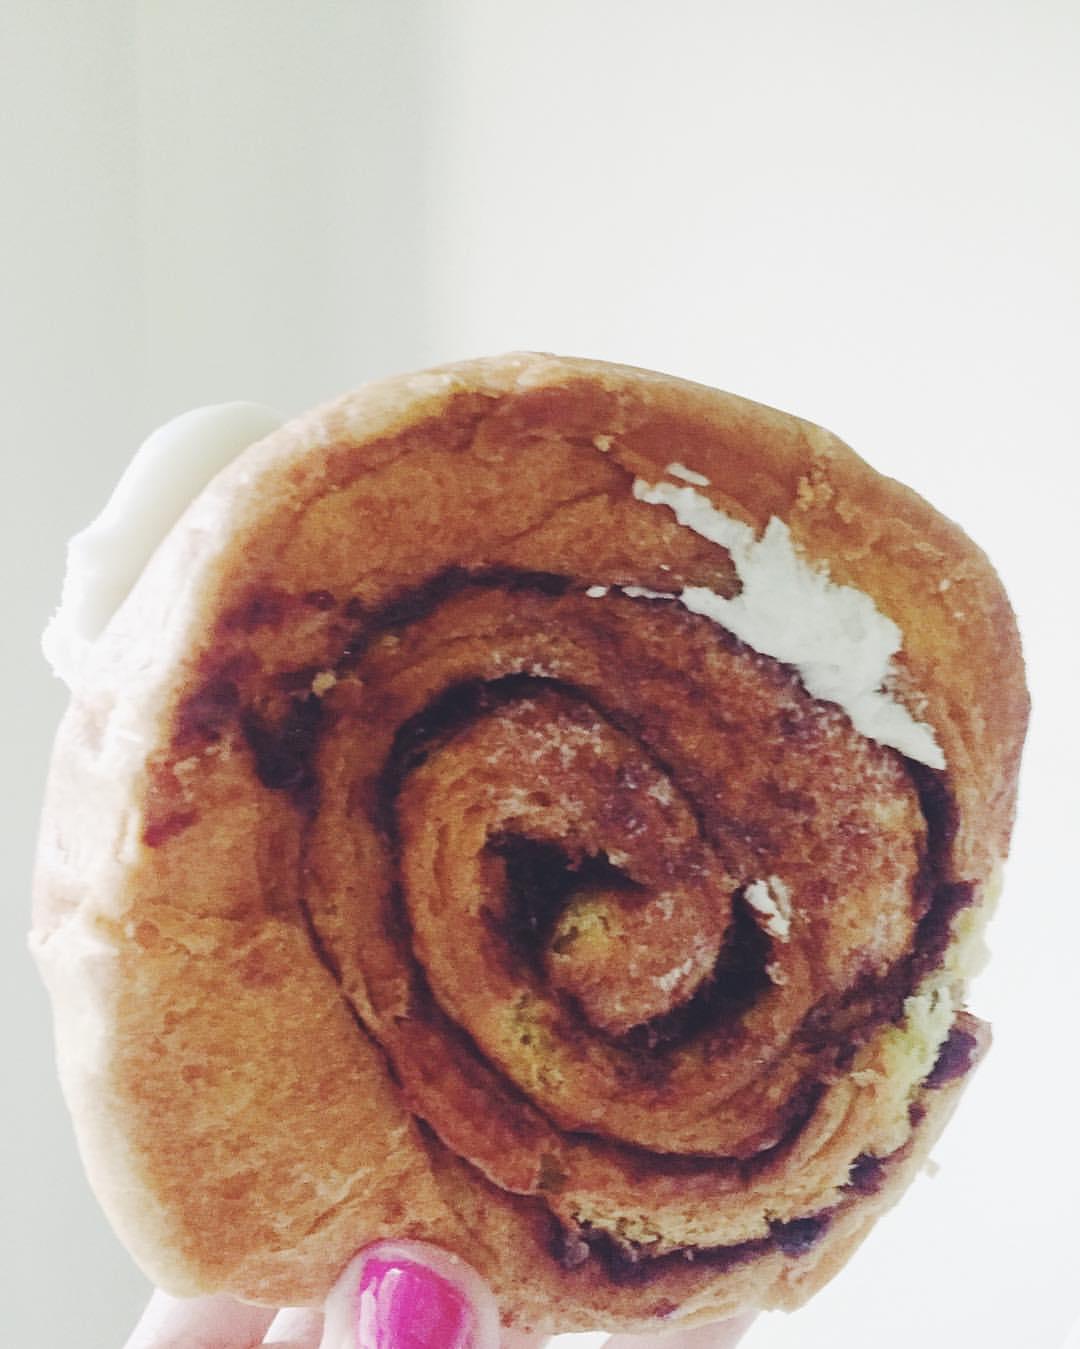 Homemade cinnamon roll from Andy's Deli in Middle Village?Because Wednesday.                #frostingfordaysss #middlevillage #middlevillageny #middlevillagequeens #eliotave #eliotavenue #queenseats #eeeeeats #heartofqueens  (at Andy's Delicatessen)